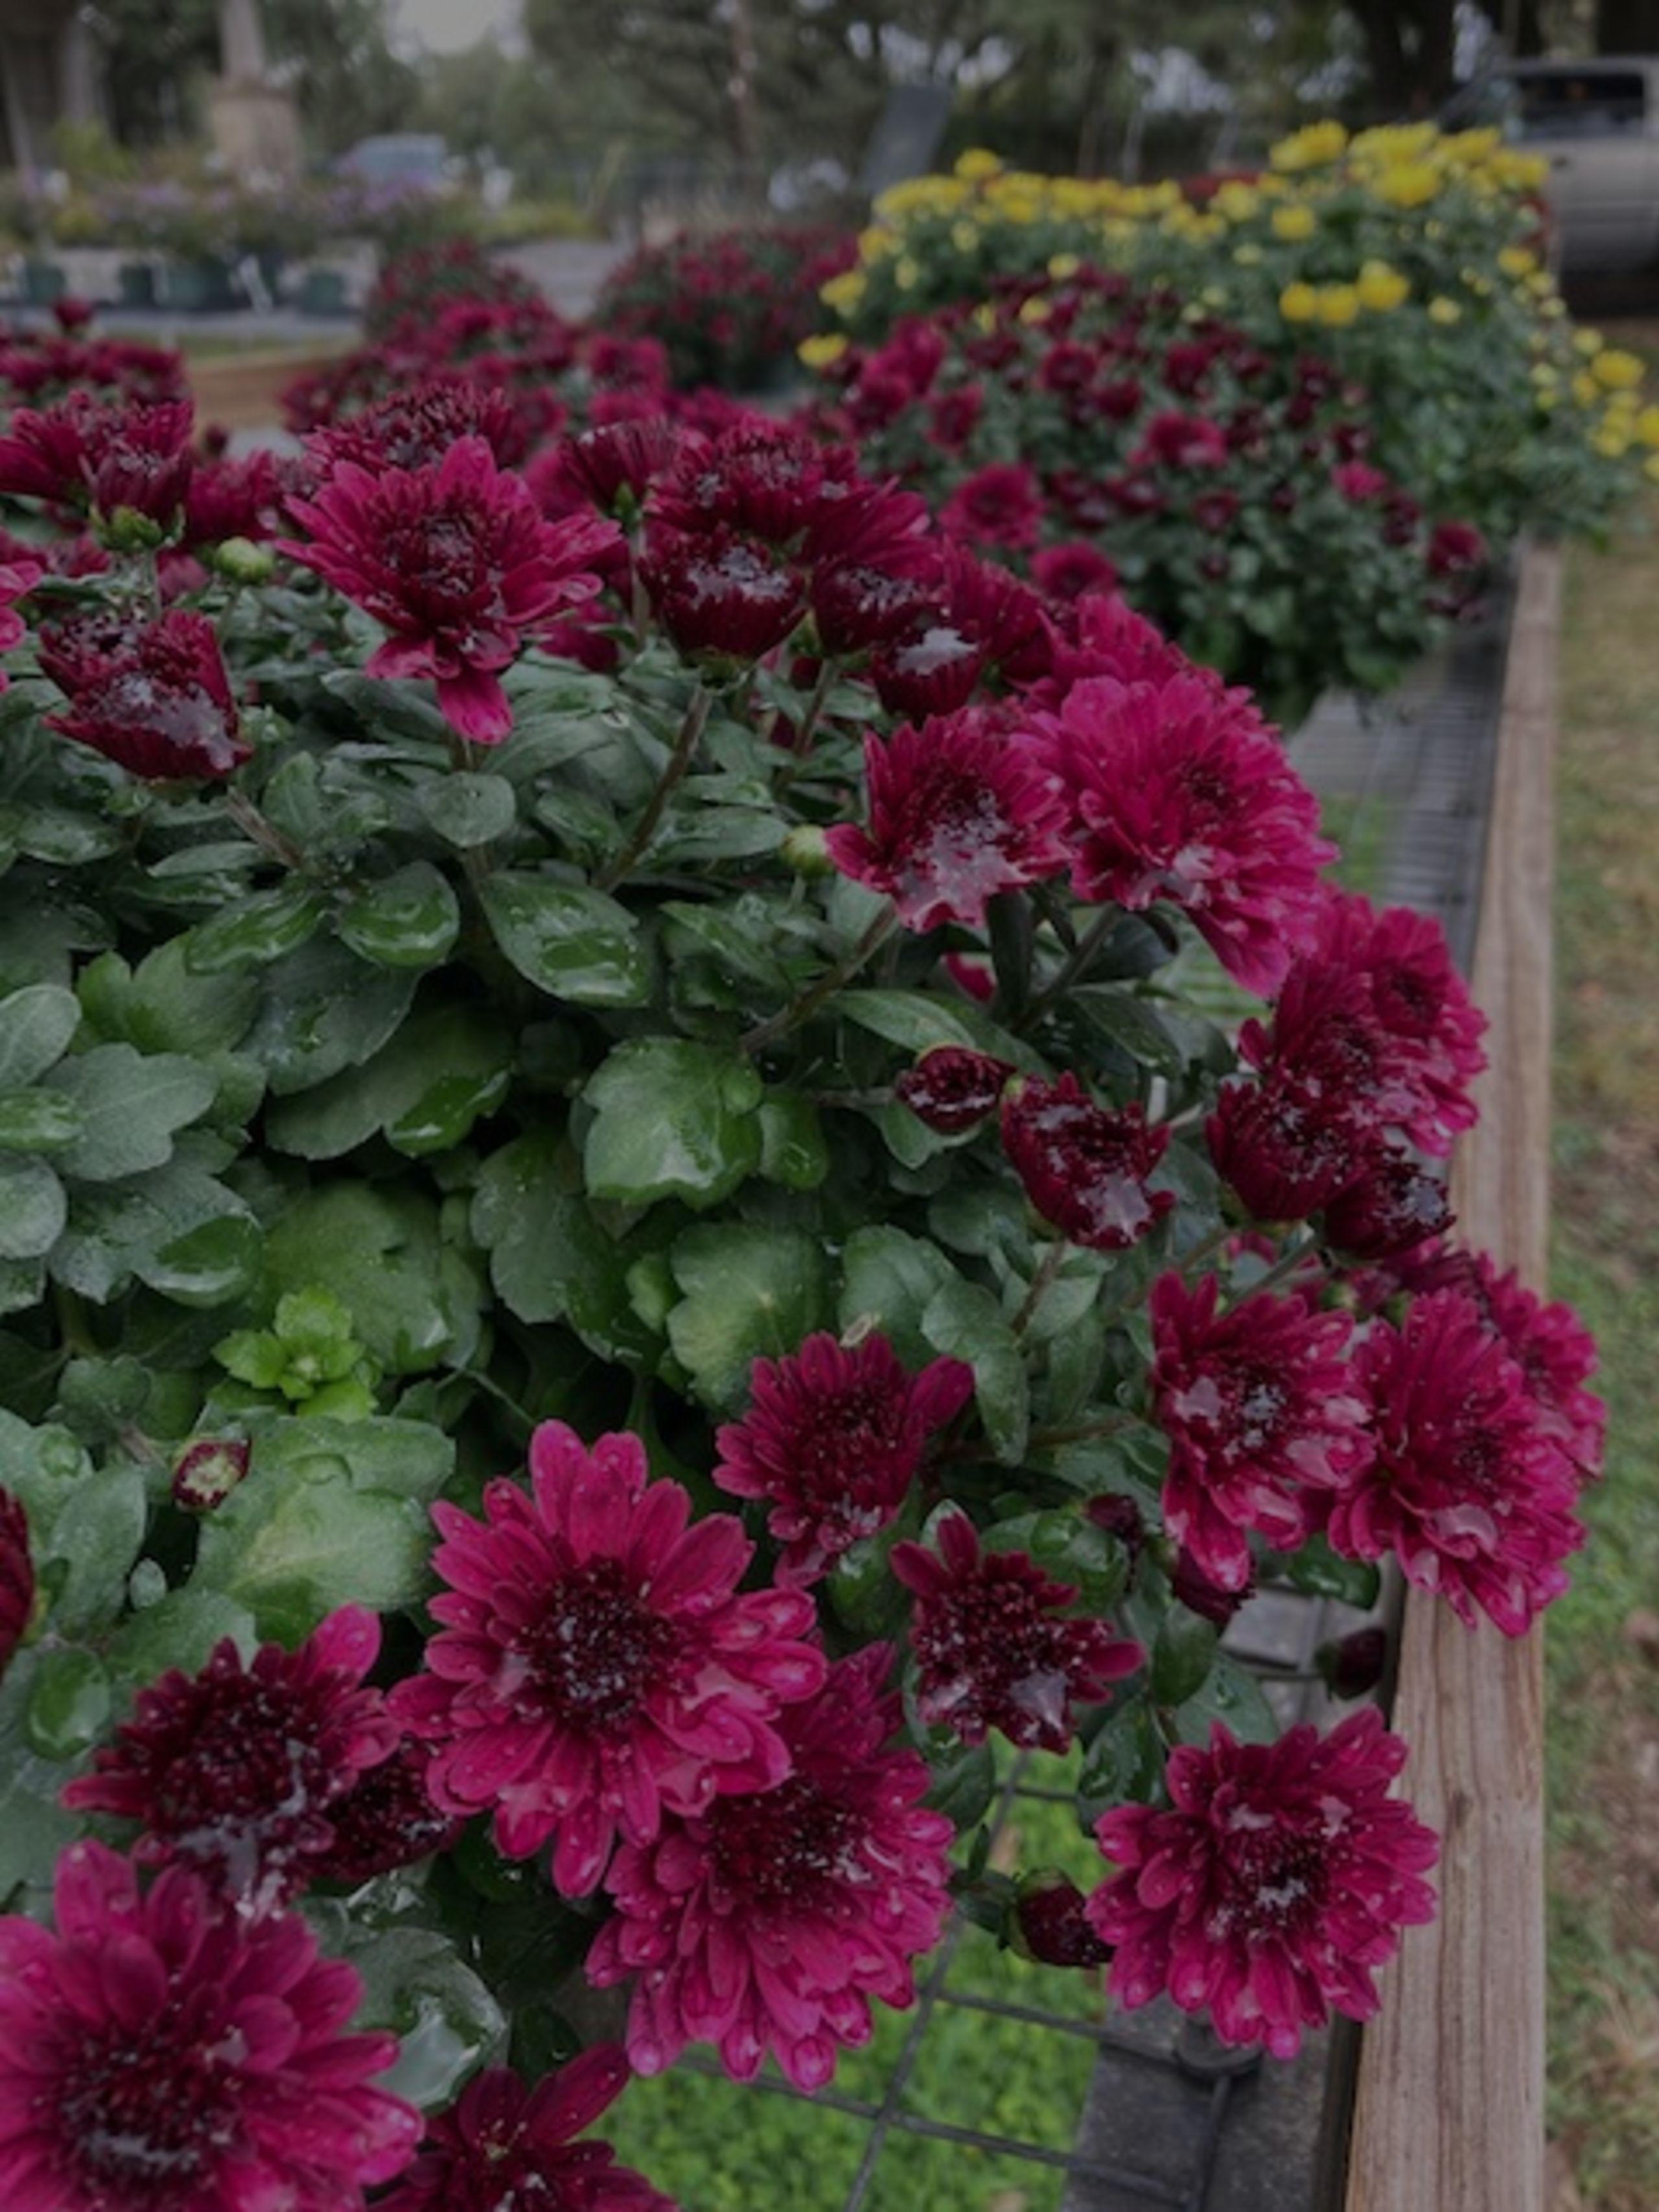 Show Me Boerne:  My favorite plant nursery